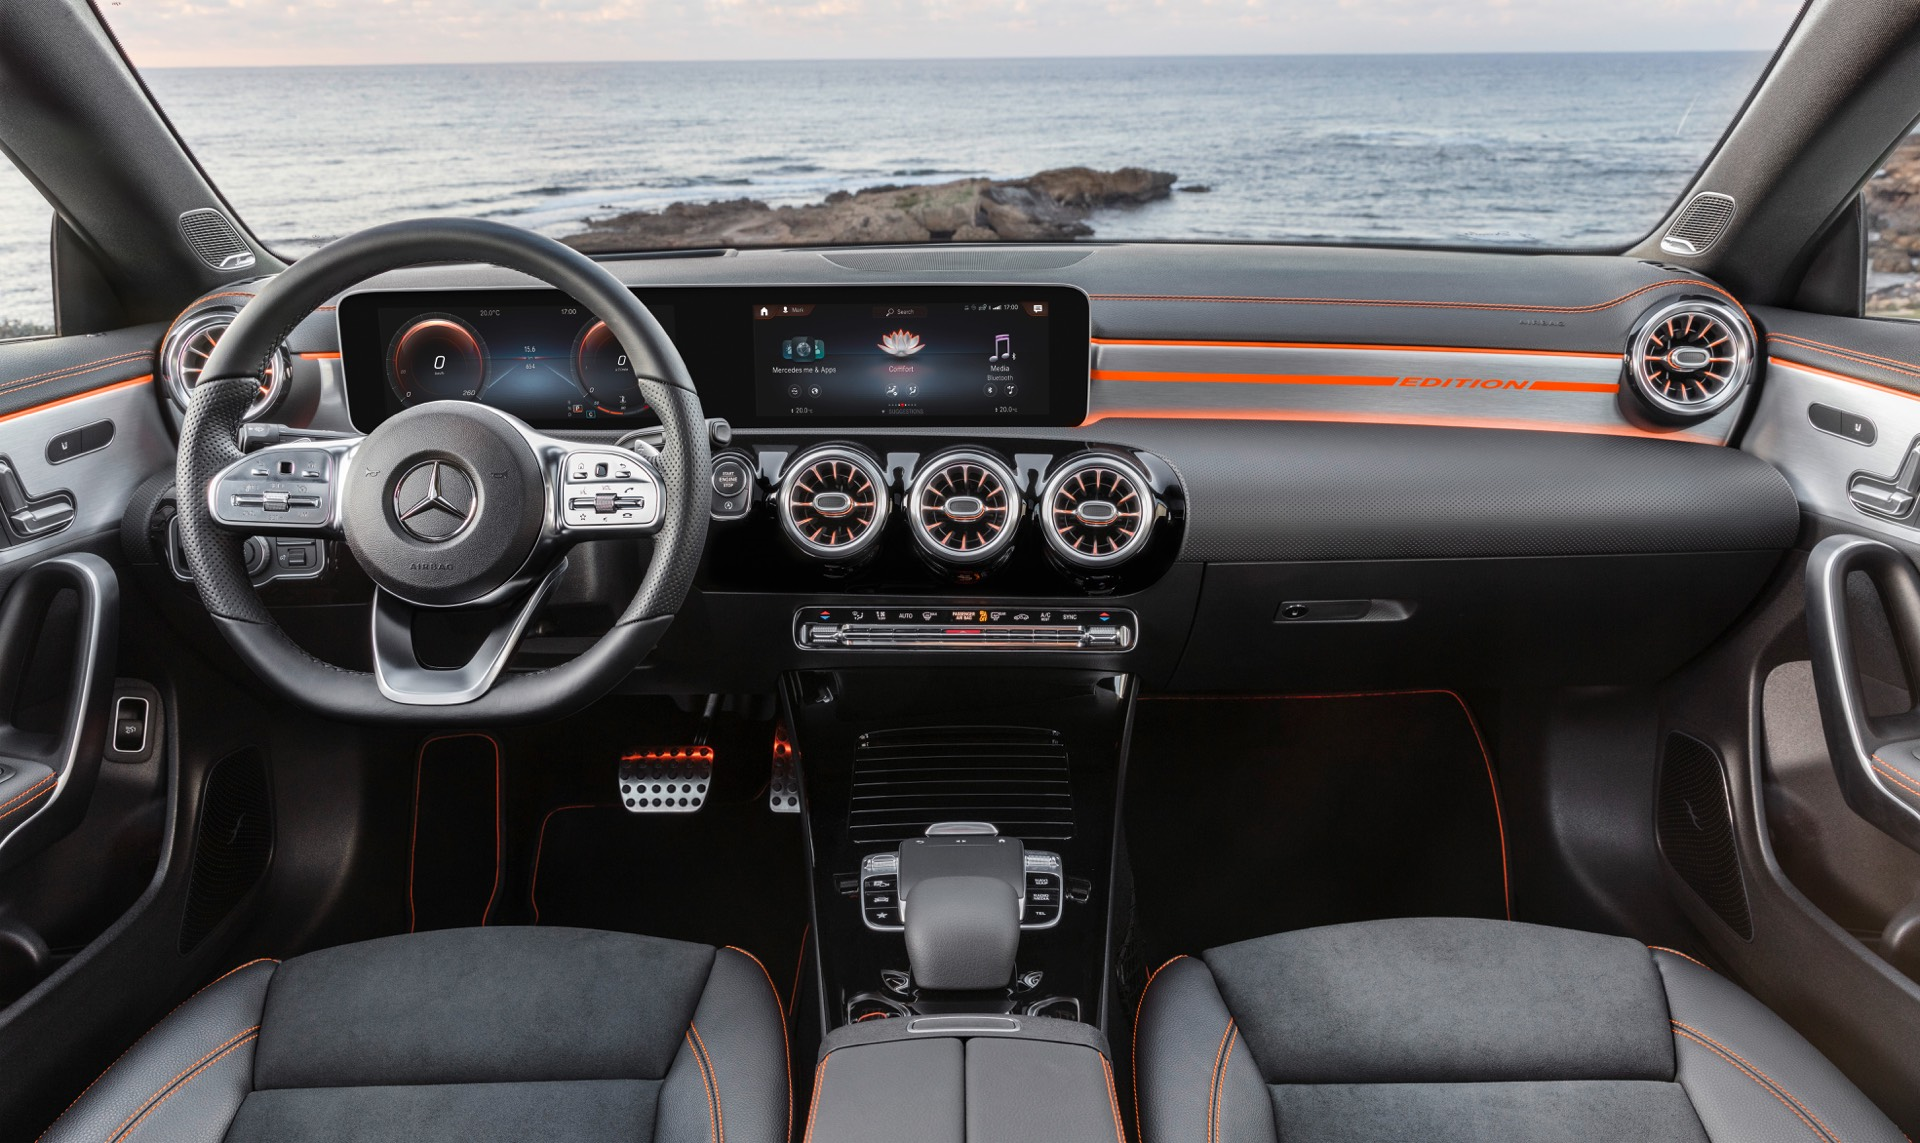 New Mercedes-Benz CLA Class Interior